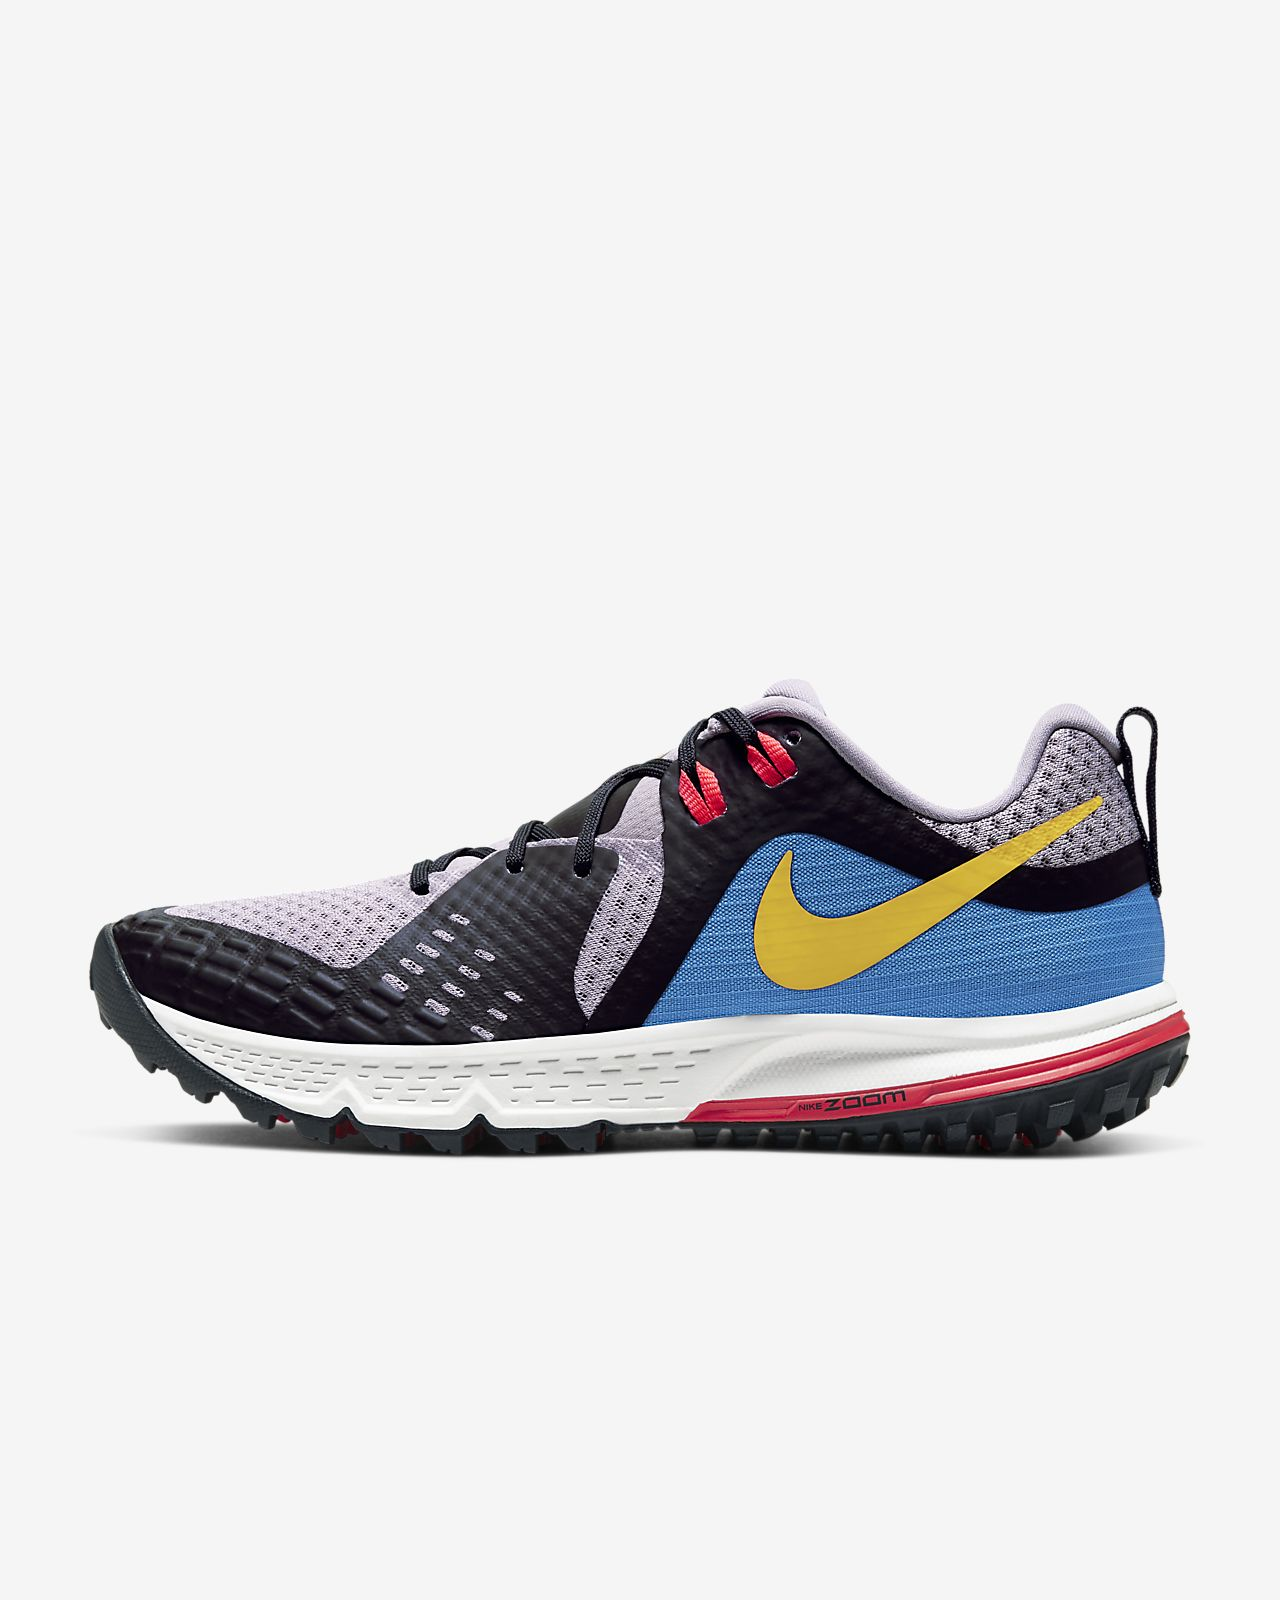 Calzado de trail running para mujer Nike Air Zoom Wildhorse 5